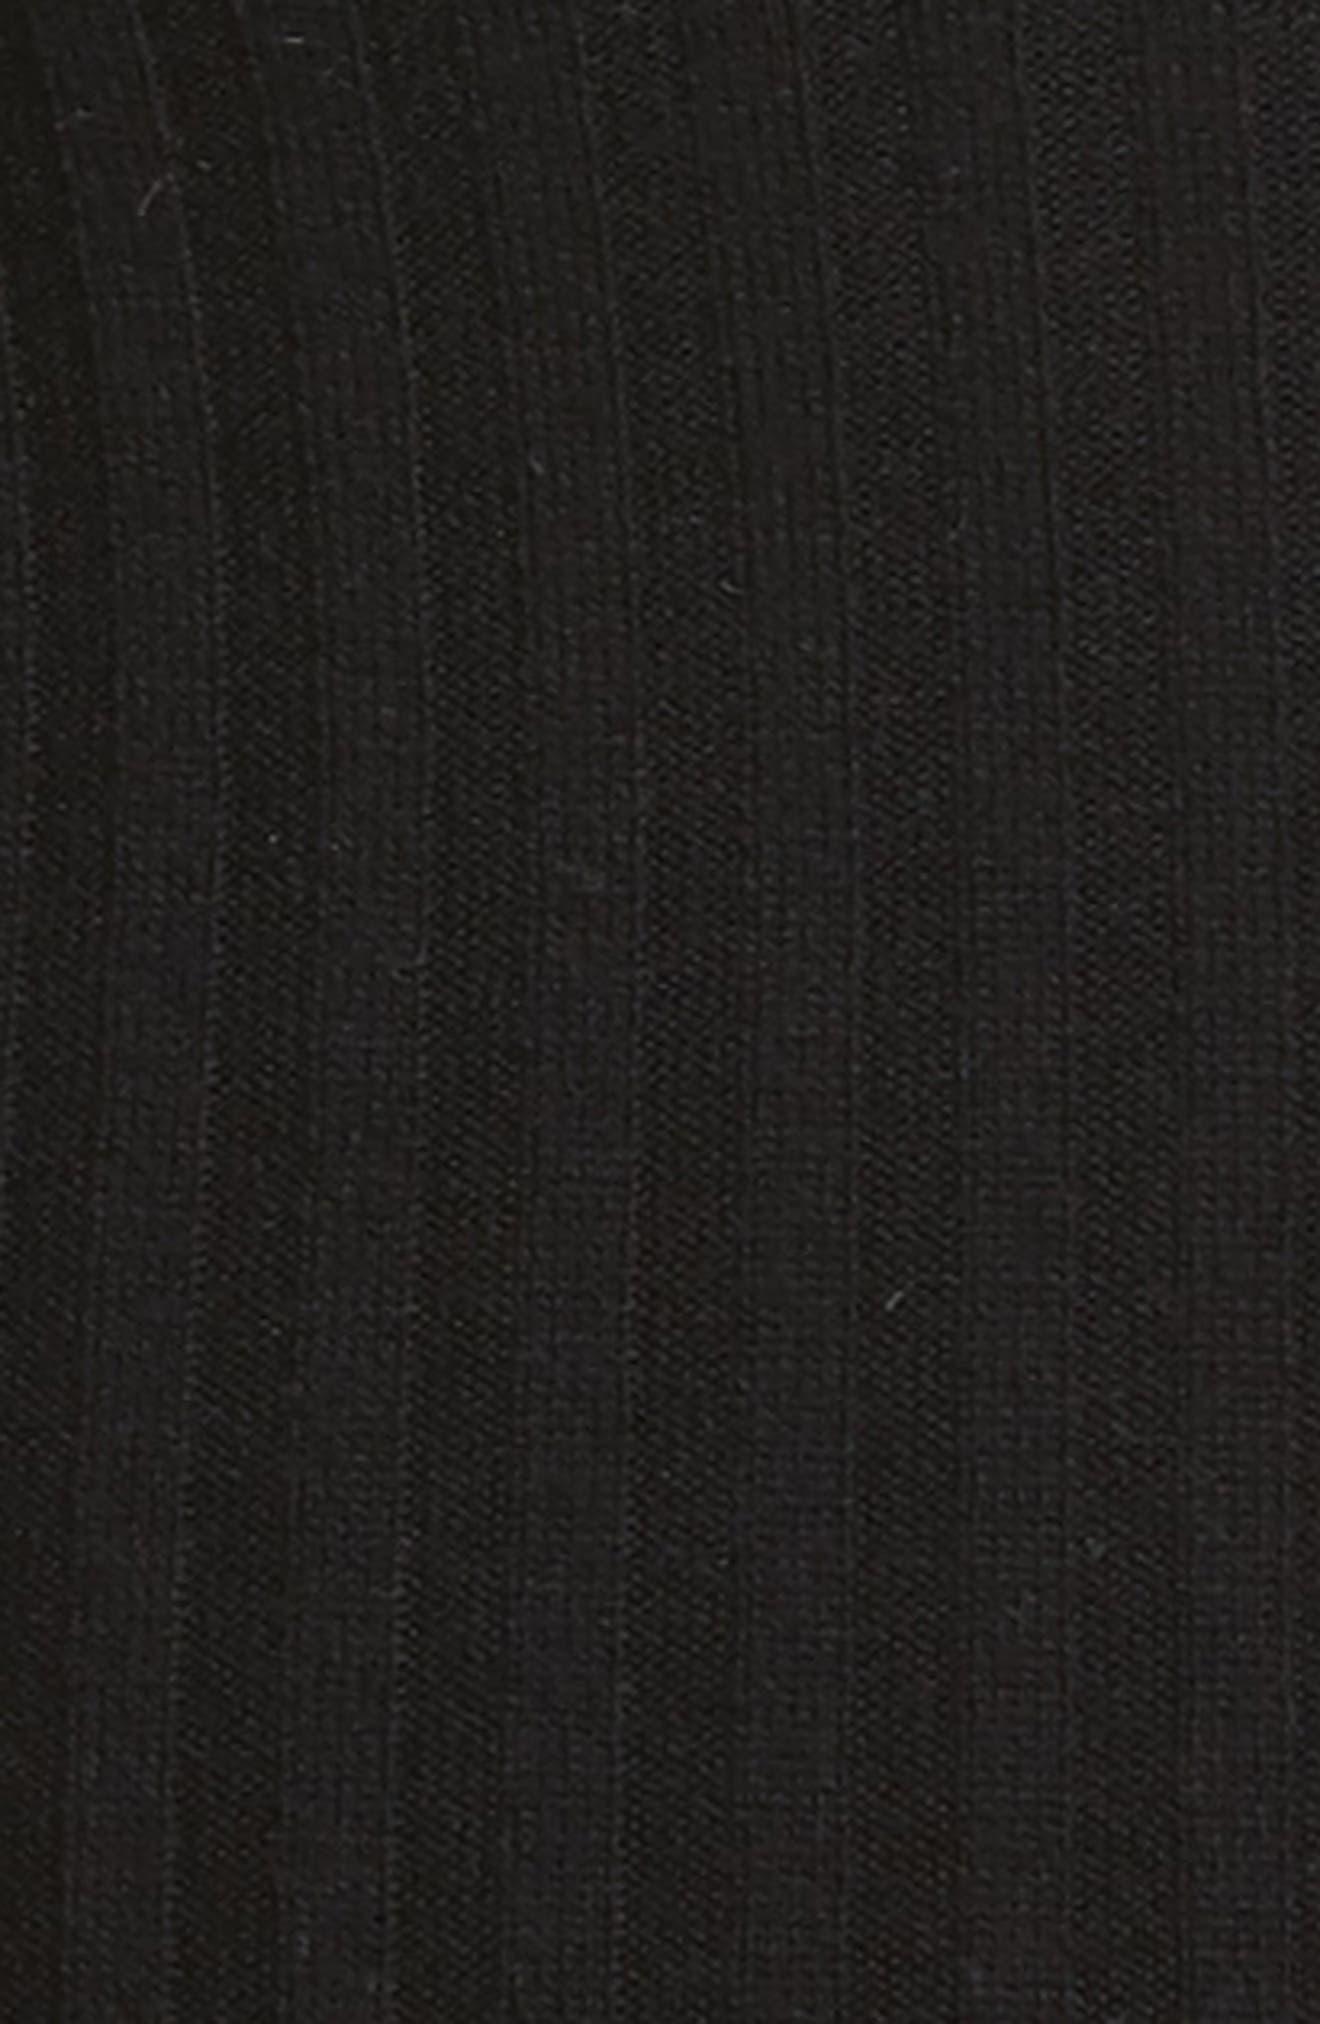 Ribbed Leggings,                             Alternate thumbnail 6, color,                             Black